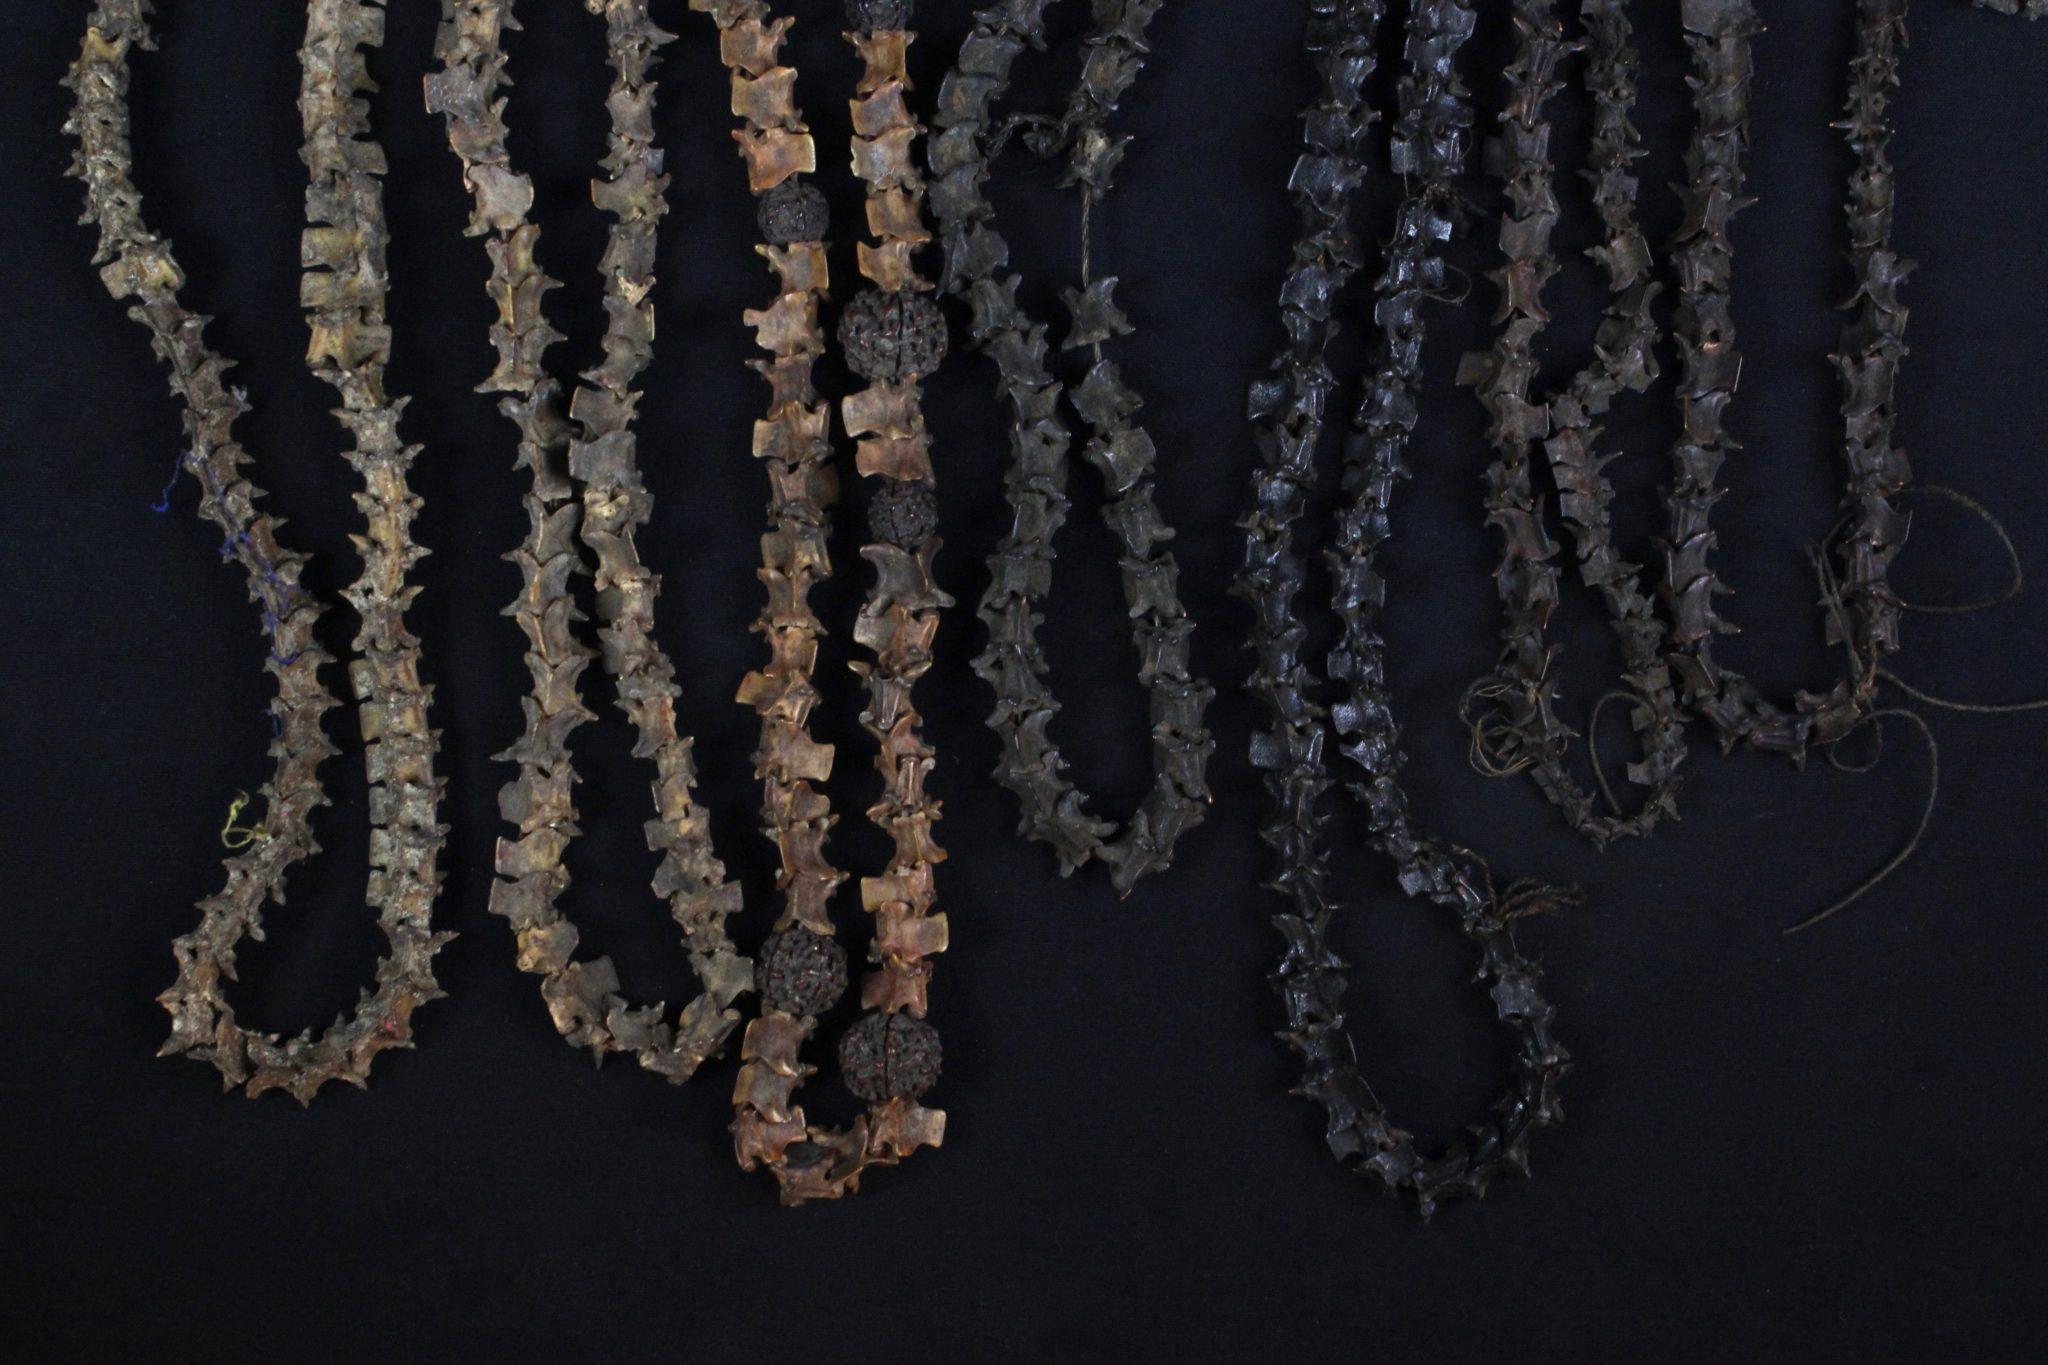 Snake Vertebrae Necklace Early 20th c. Snake Vertebrae, Rudraksha seeds Invokes snake gods to protect shaman during healing rituals